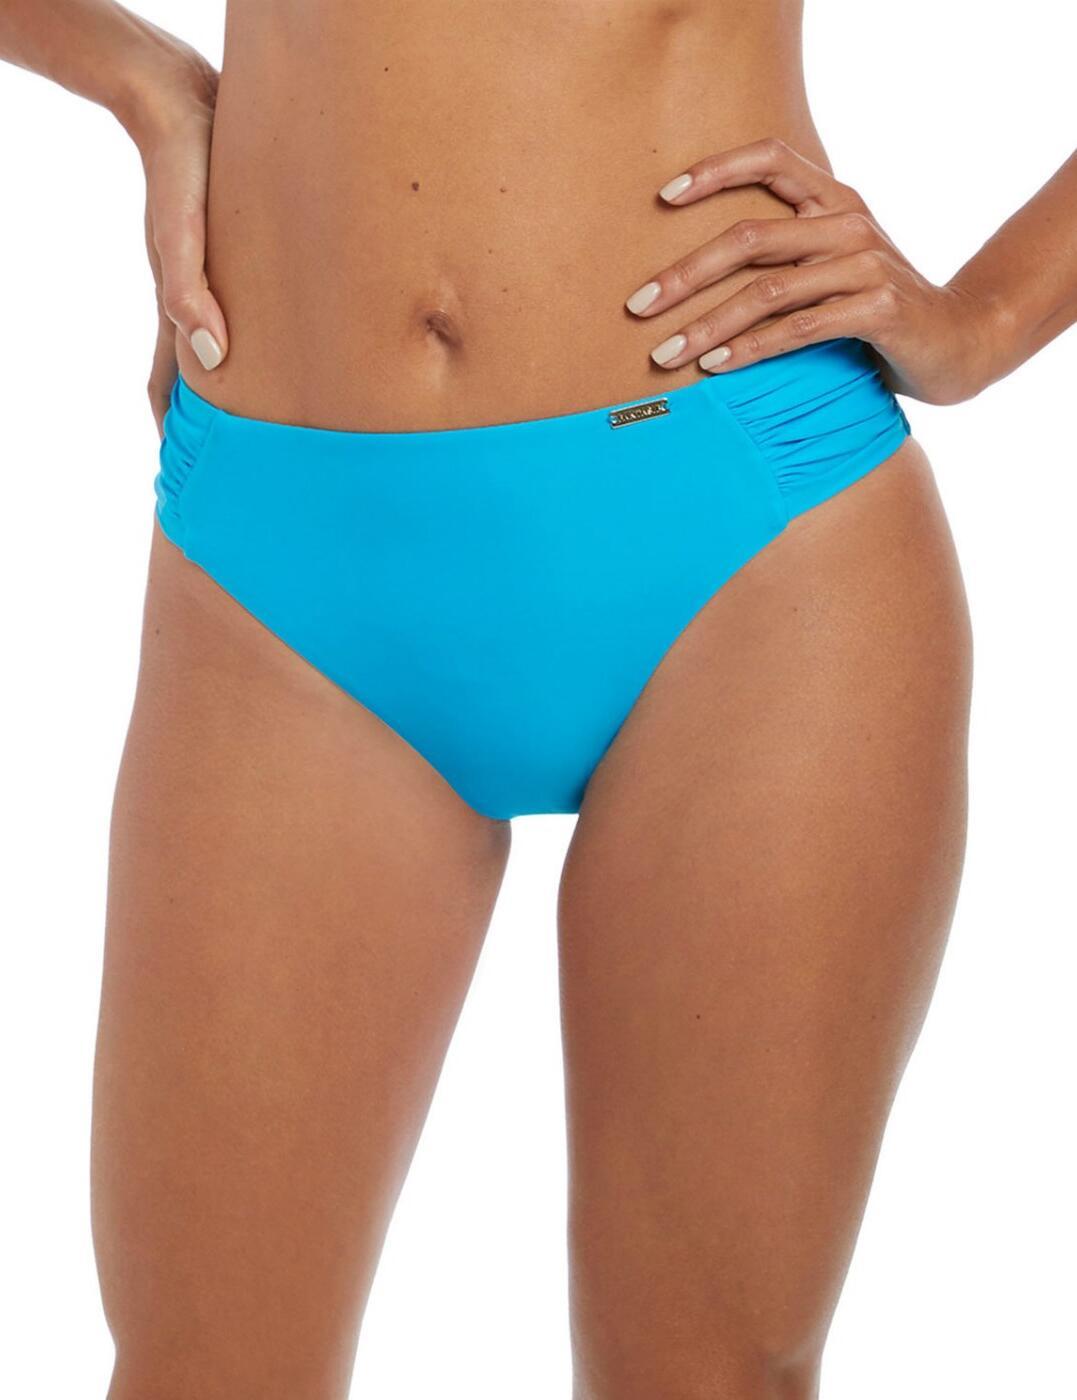 6550 Fantrasie Paradise Bay Mid Rise Bikini Brief - 6550 Aqua